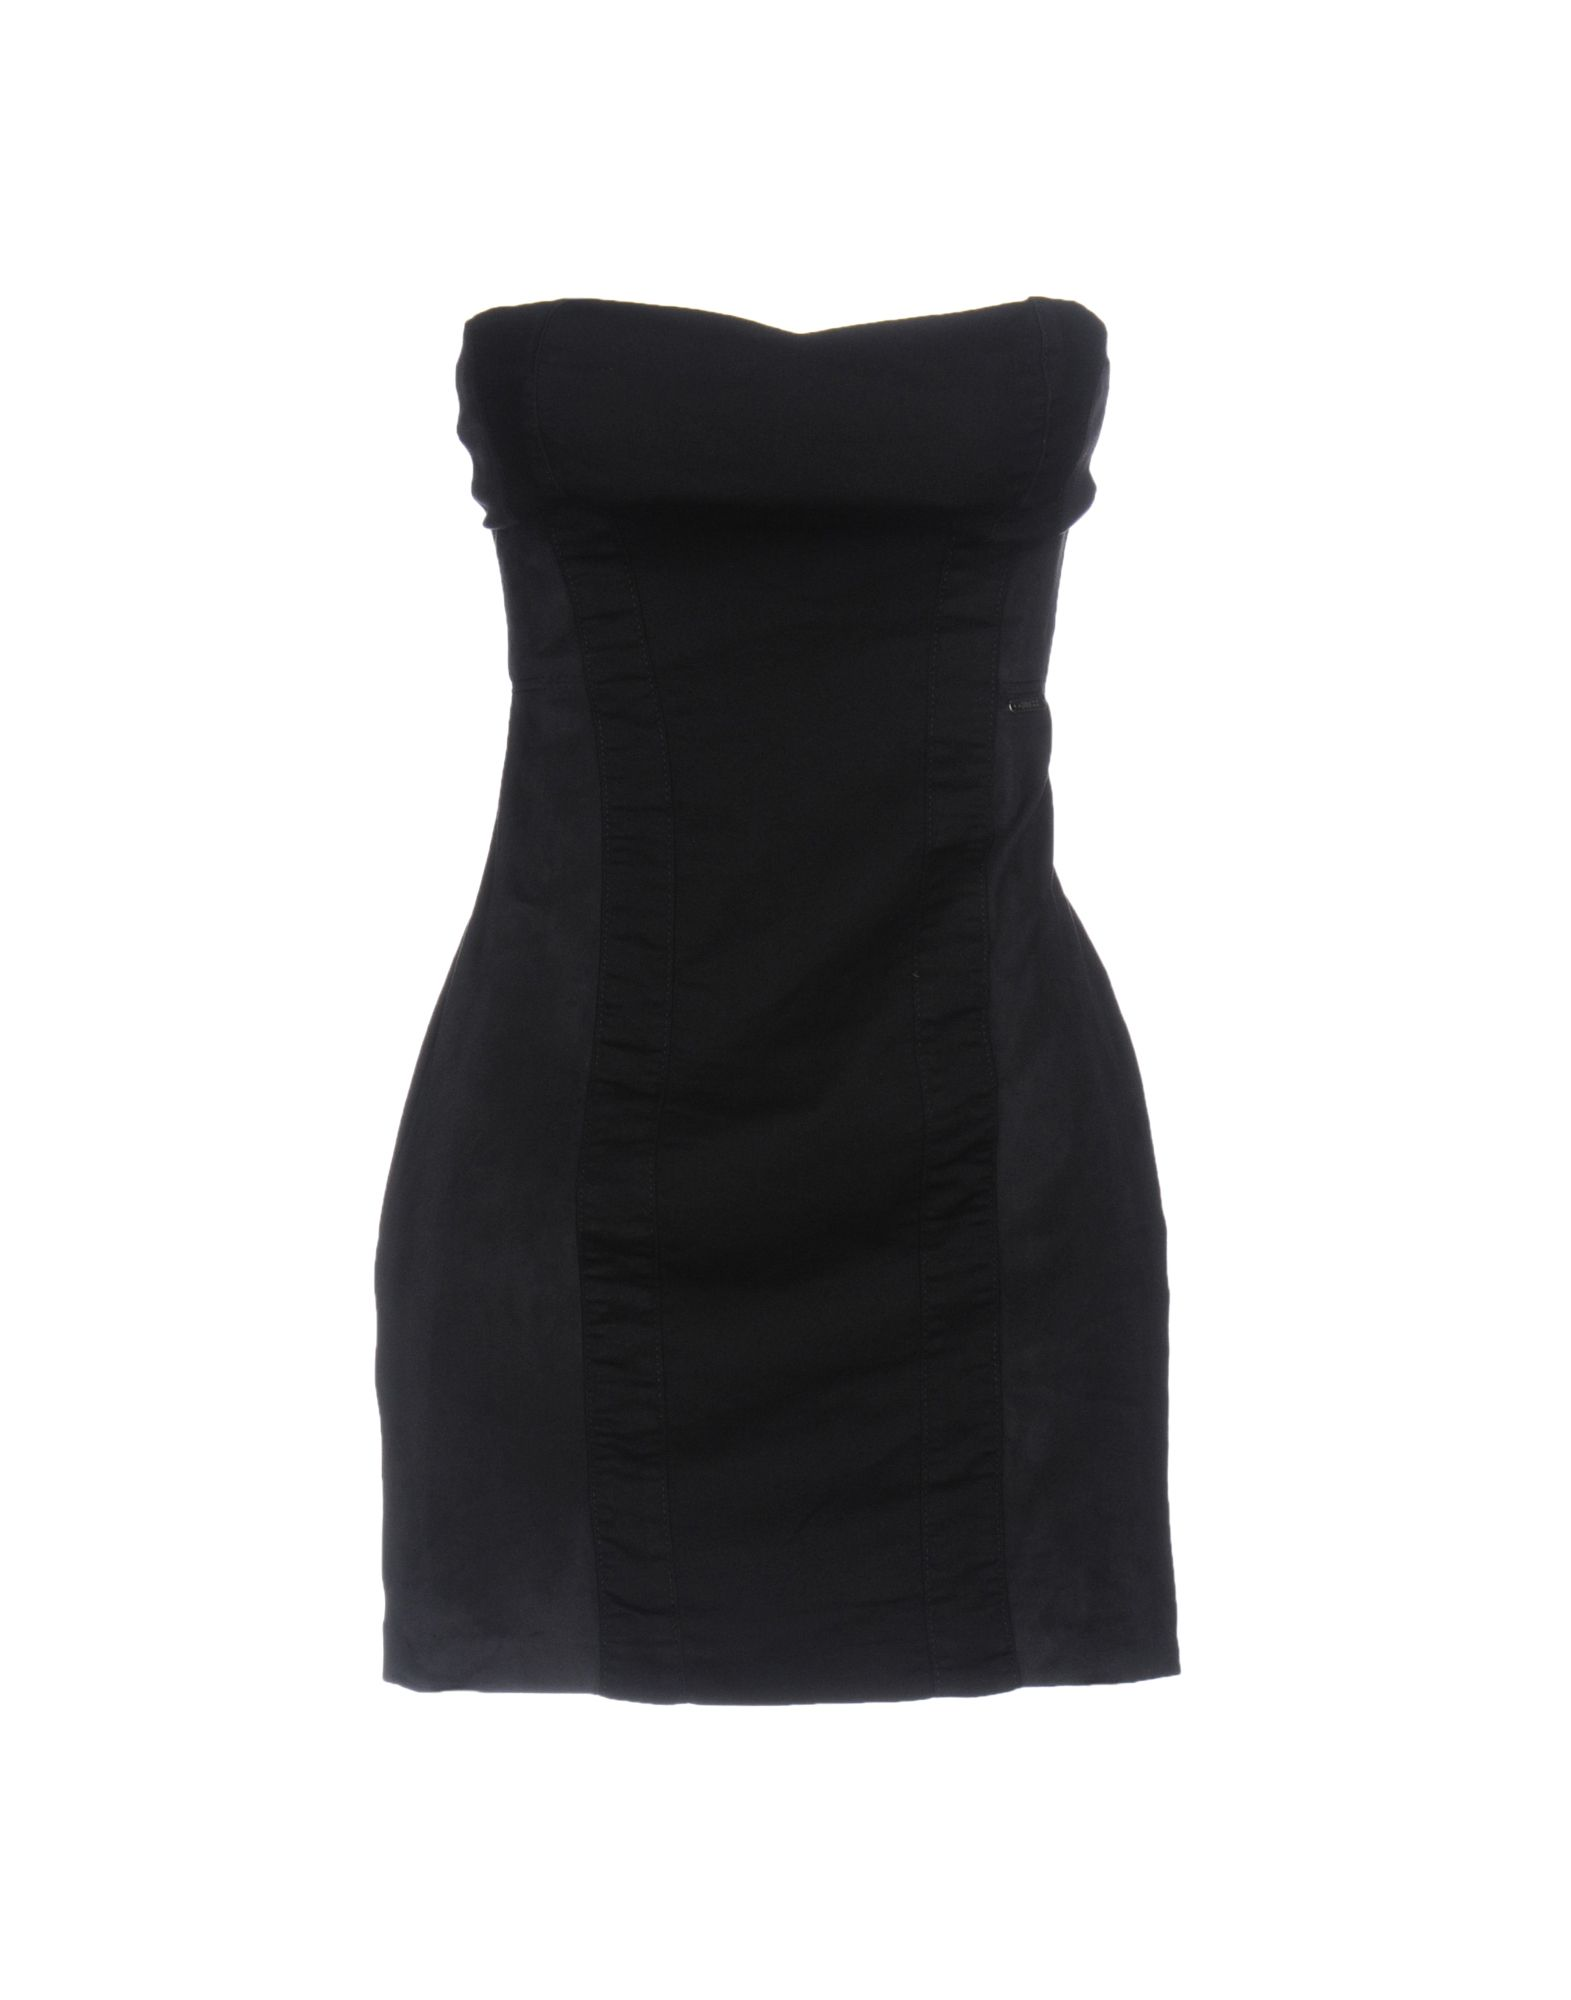 GUESS Damen Kurzes Kleid6 blau